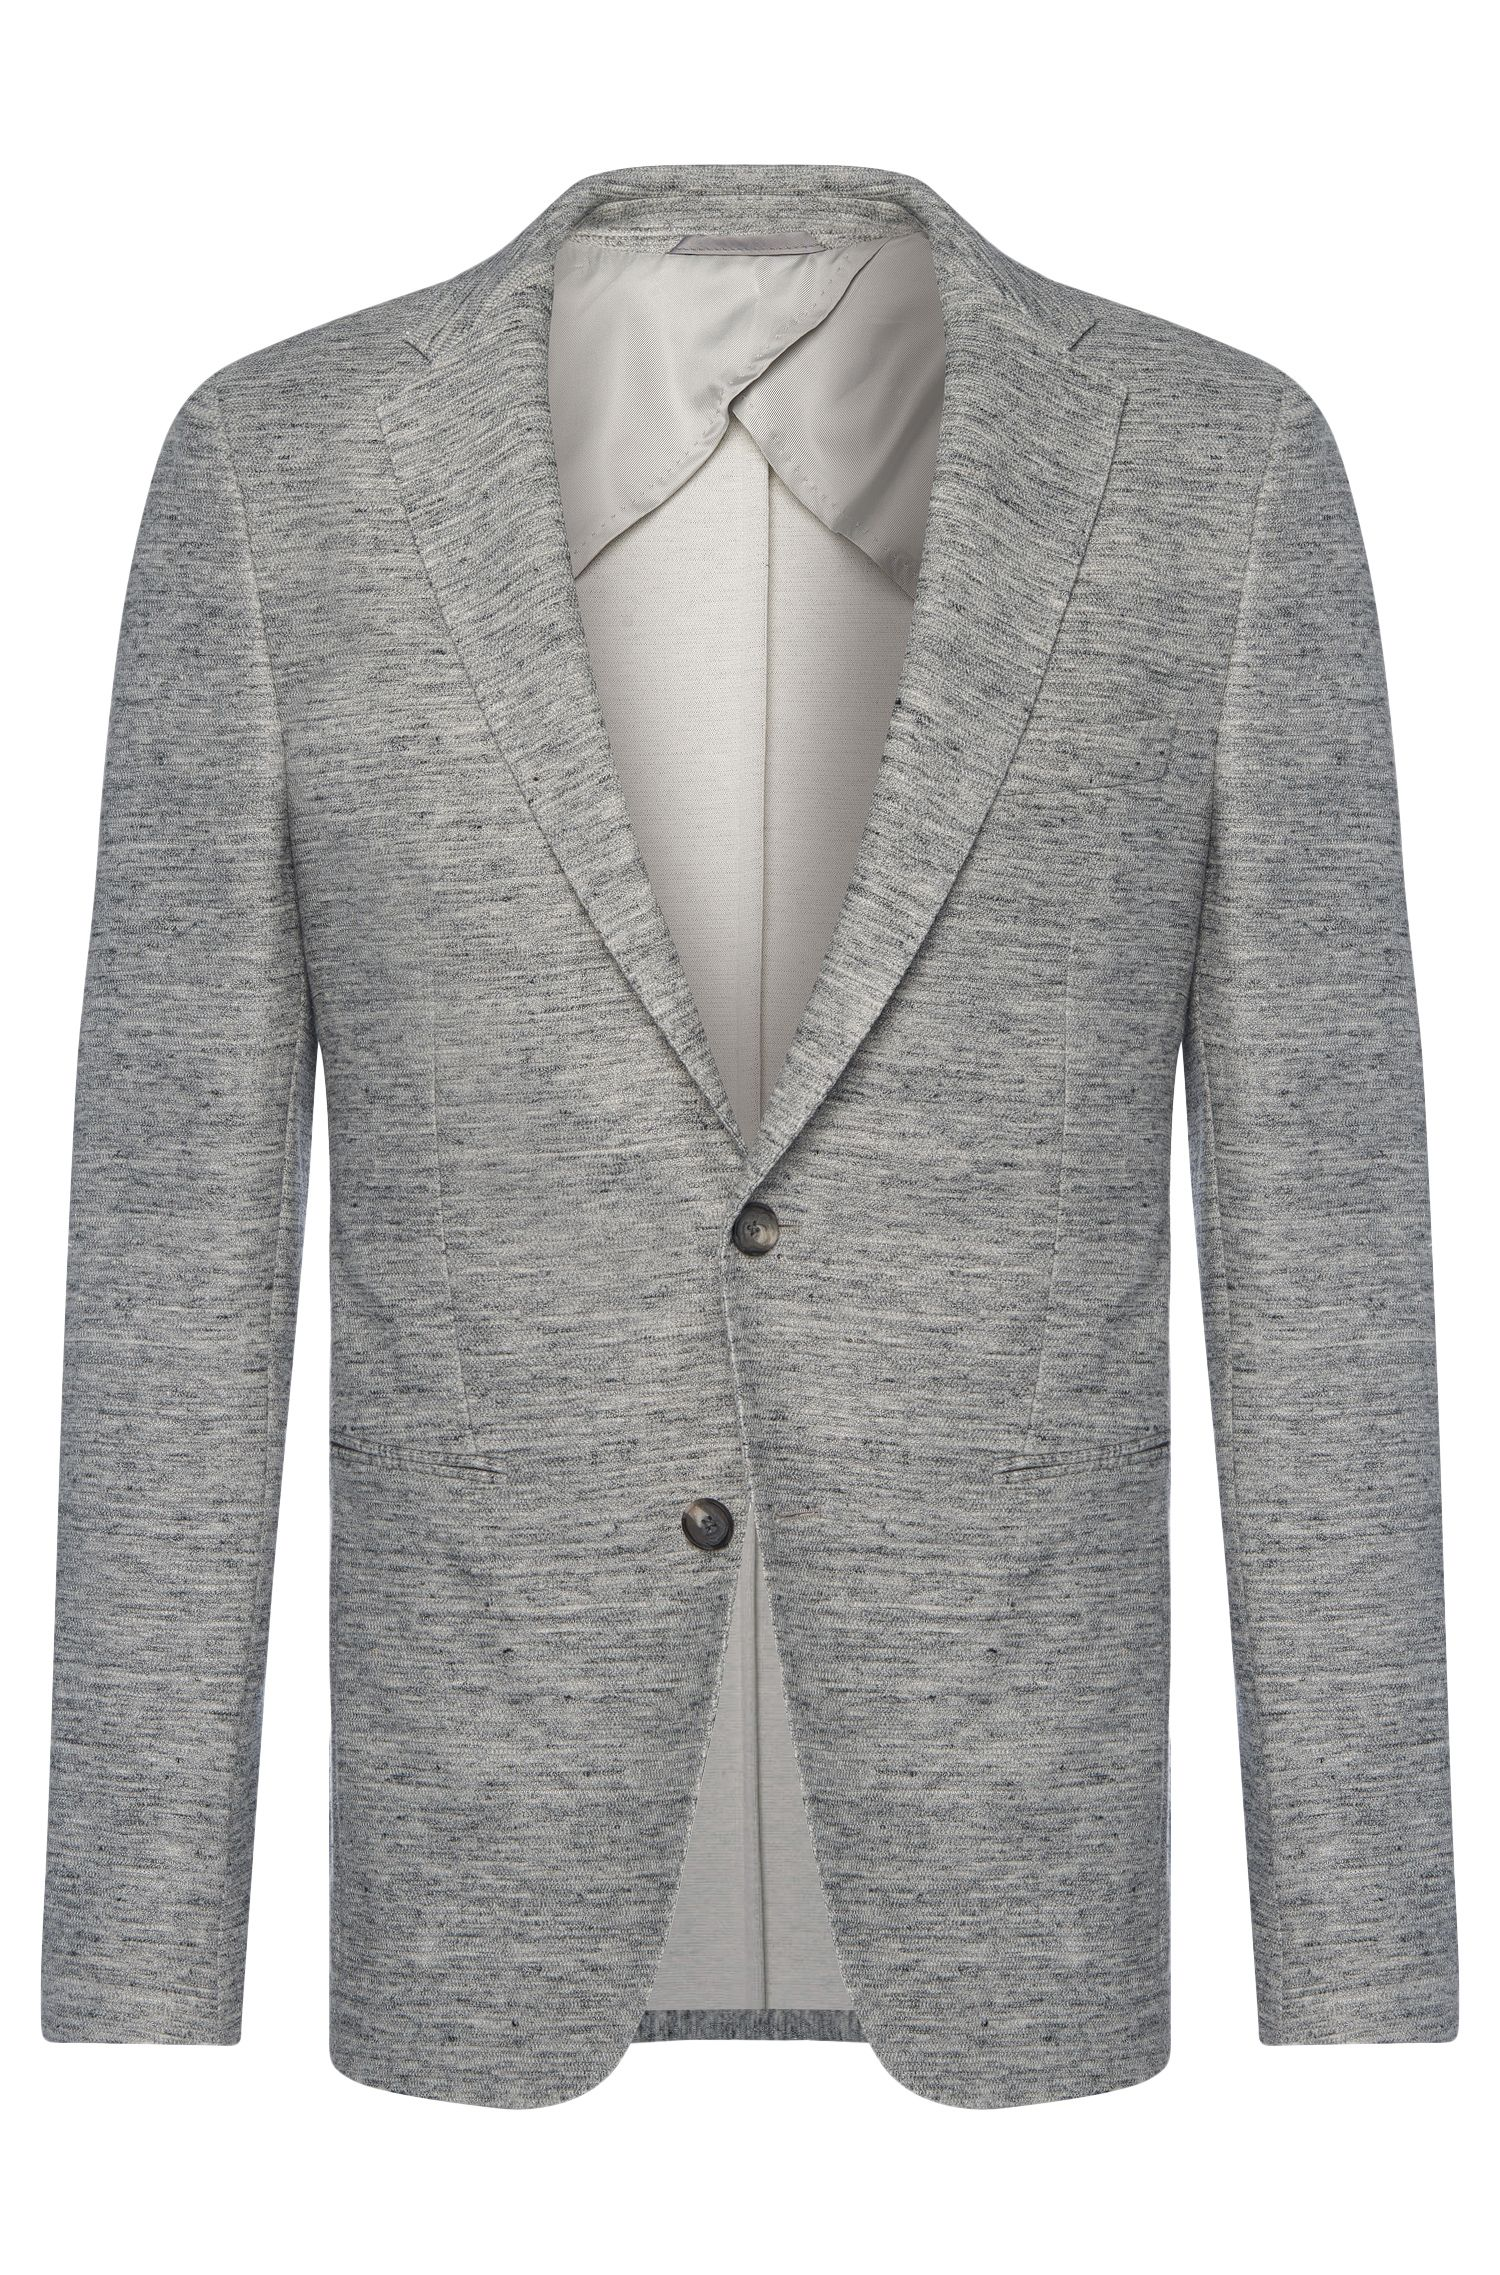 'Norwin' | Slim Fit, Stretch Cotton Linen Blend Jersey Sport Coat